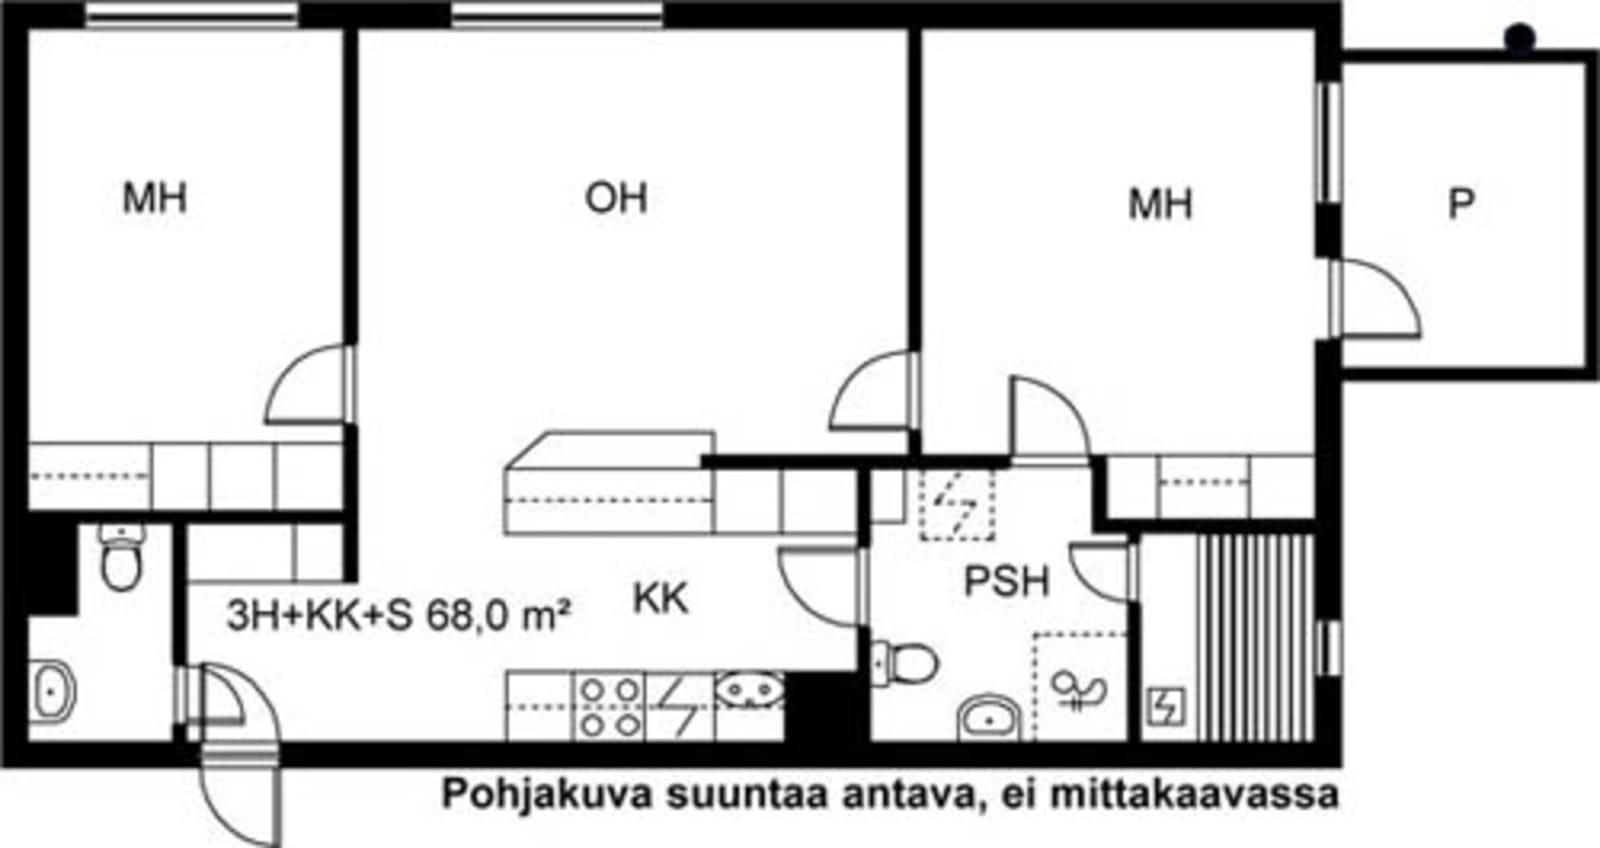 Turku, Kaerla, Kairialankatu 3 A 005